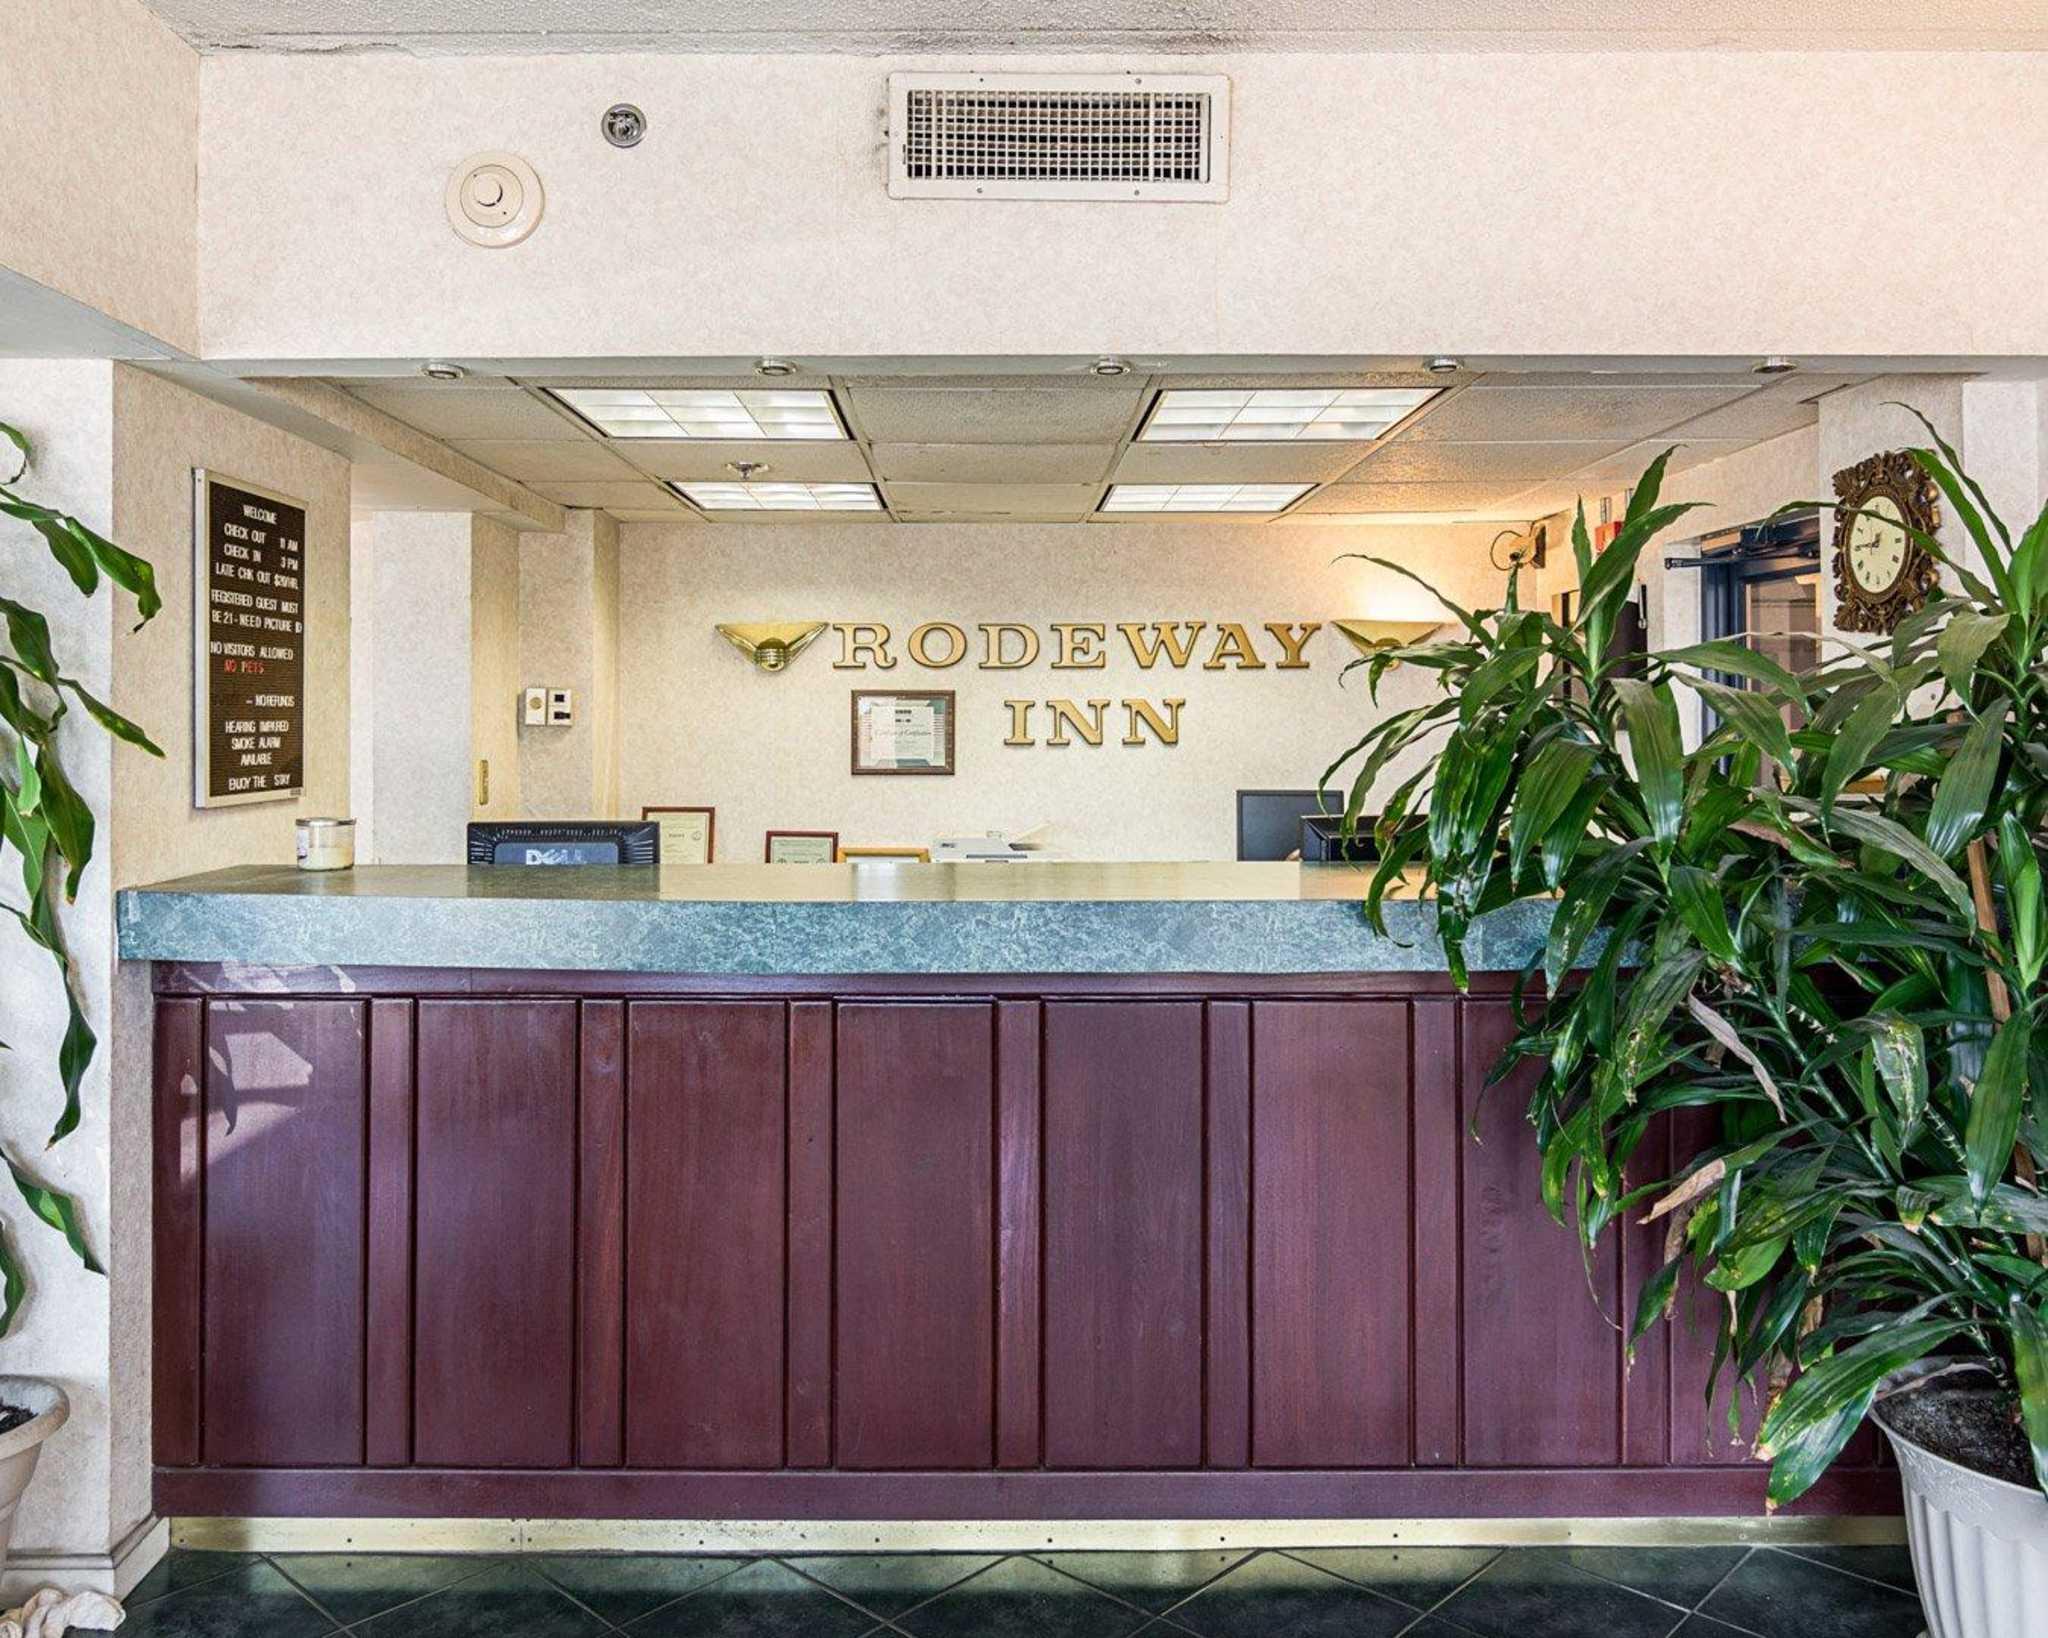 Rodeway Inn by the Beach image 4